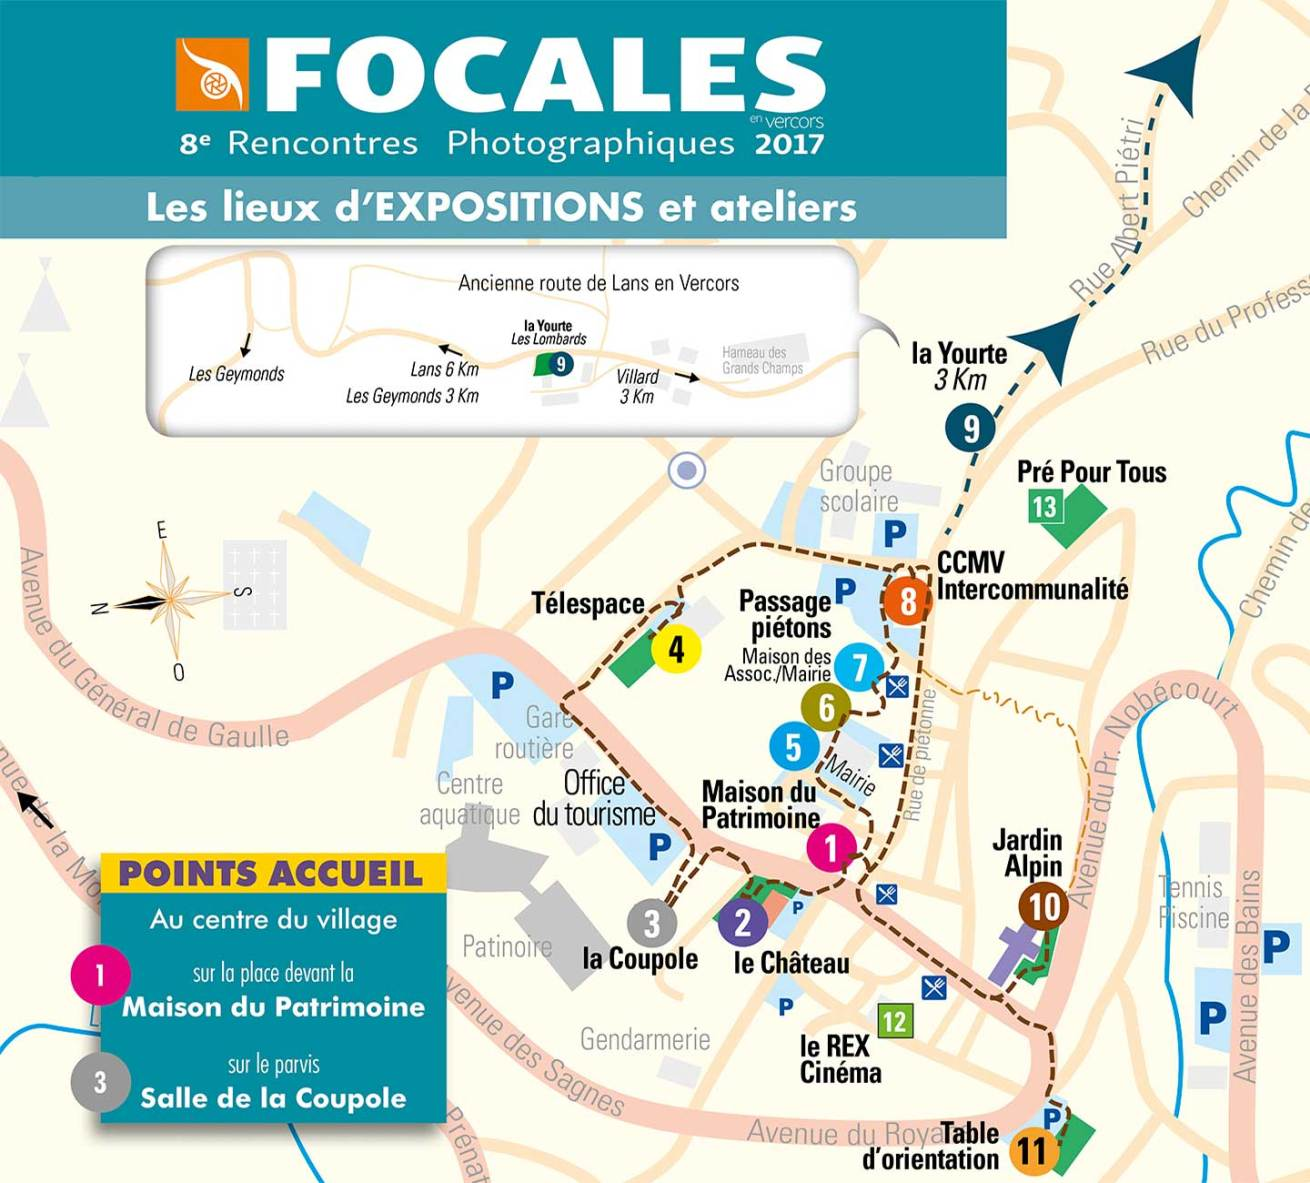 Photo festival Focales en Vercors, practical information